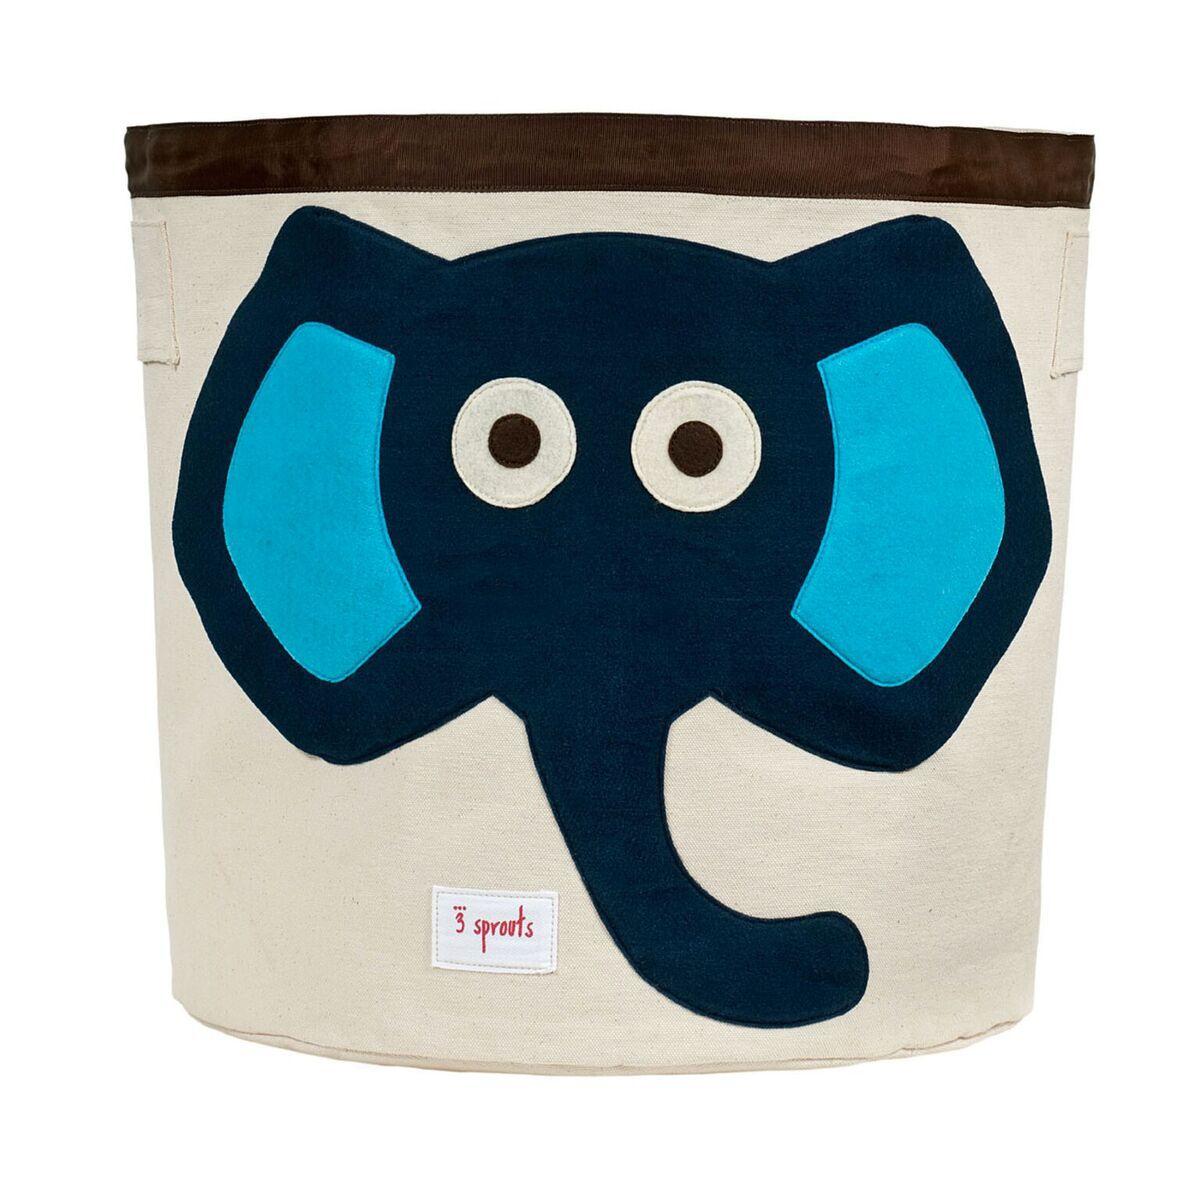 Cesto Organizador Infantil Redondo 3 Sprouts - Elefante Azul 43 x 44 cm